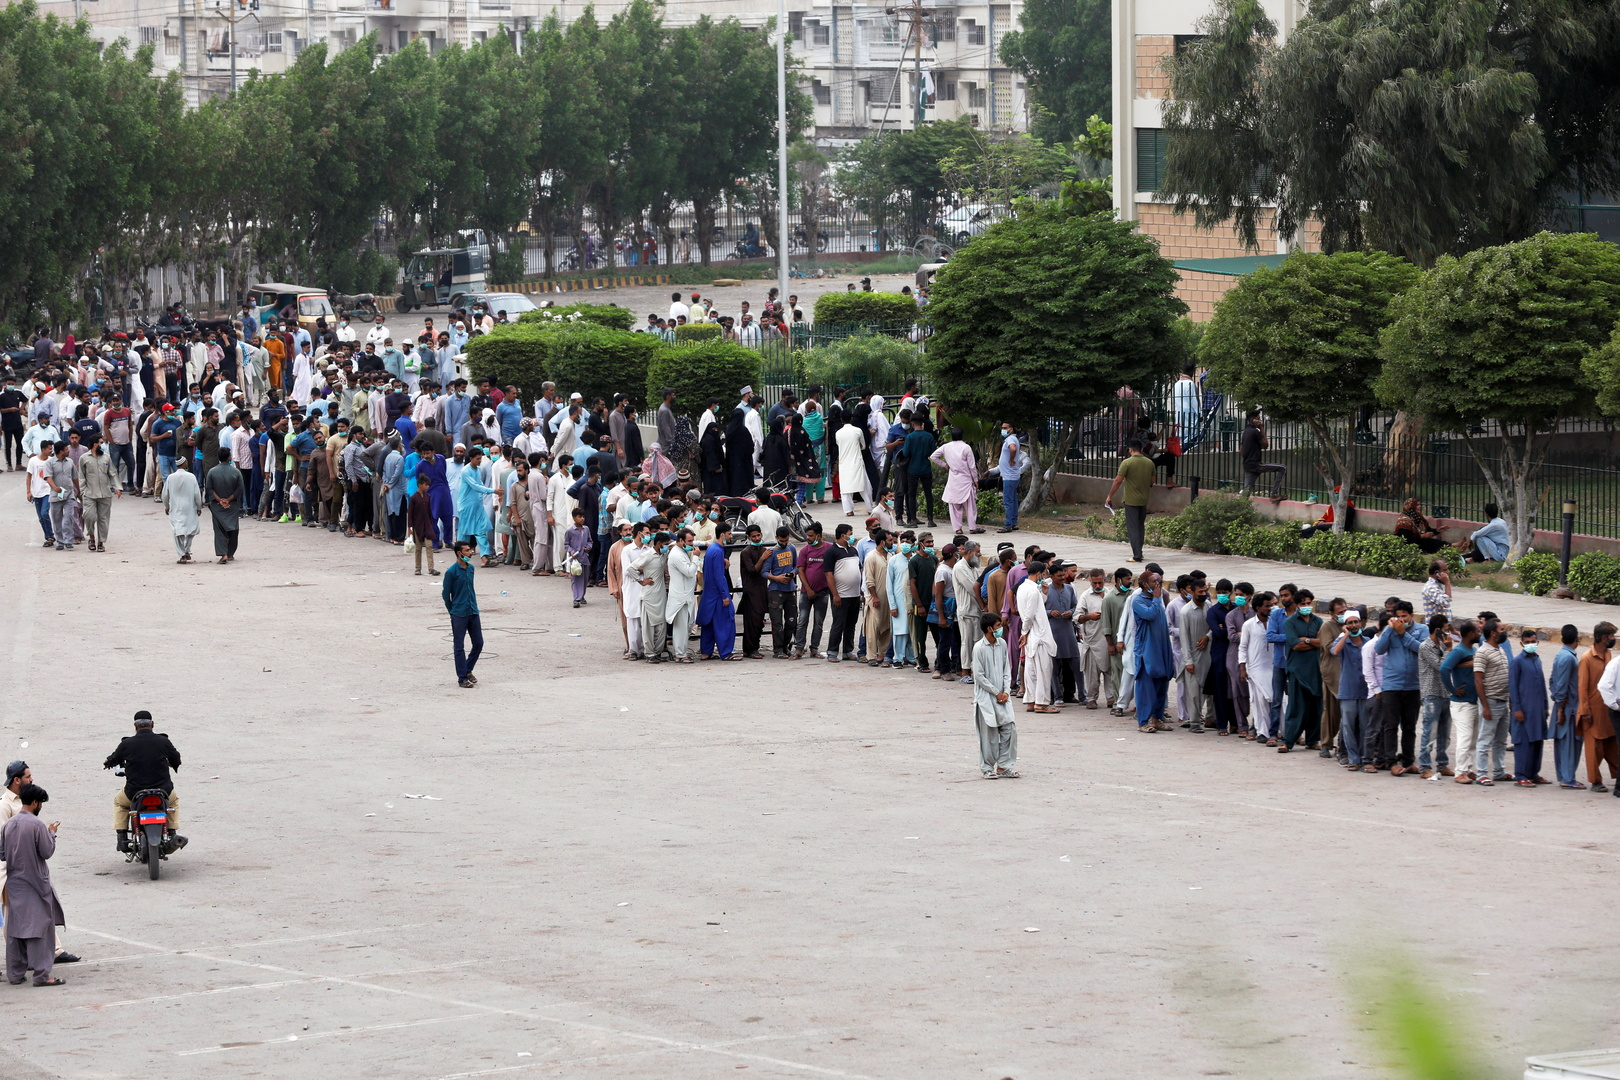 بعد تحذير.. باكستان تحقق هدفها  بتطعيم مليون شخص يوميا